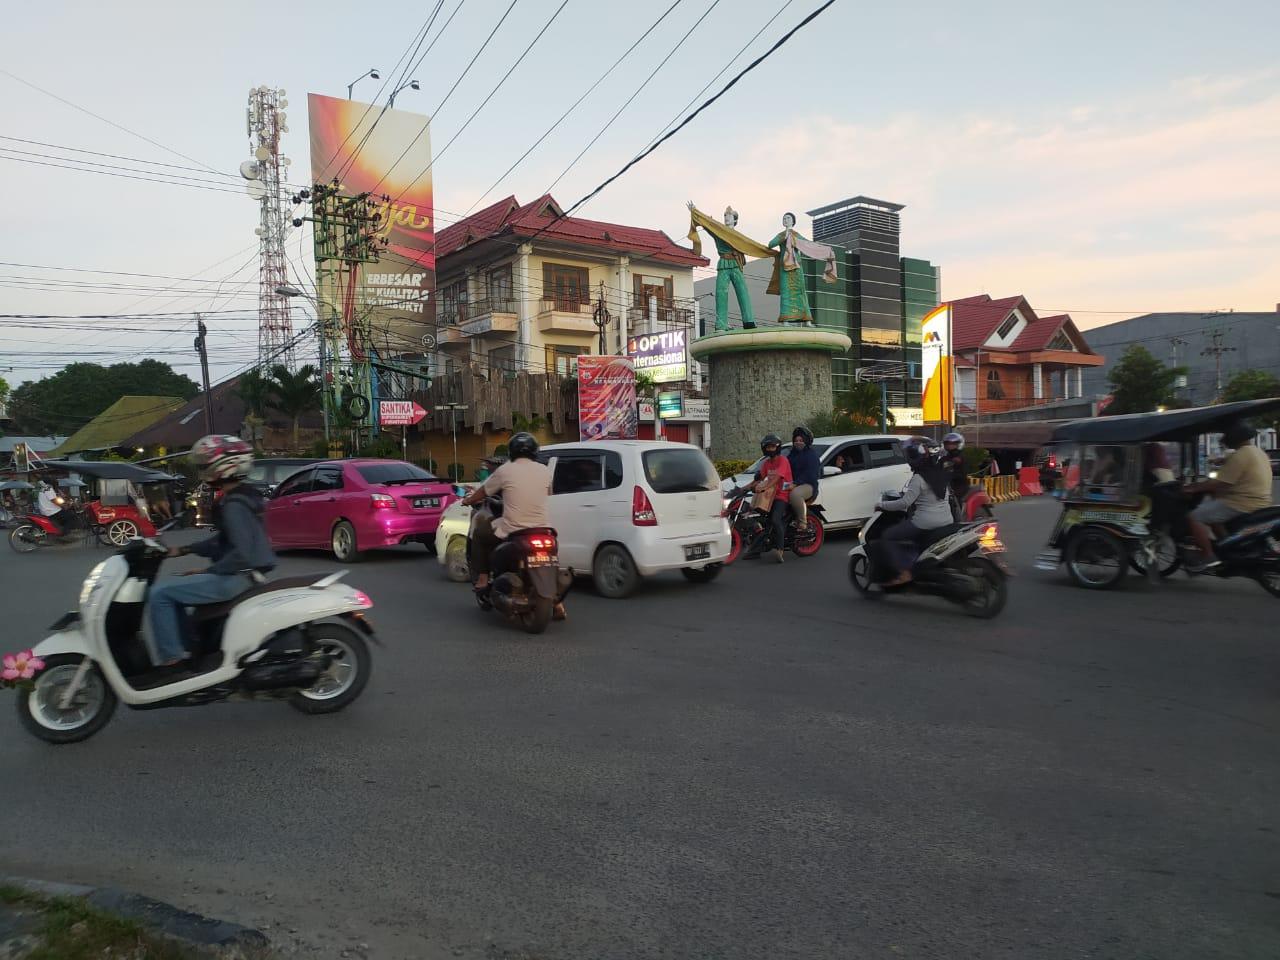 Aktivitas warga di Kota Gorontalo yang saat ini terbilang cukup ramai/Prosesnews.id